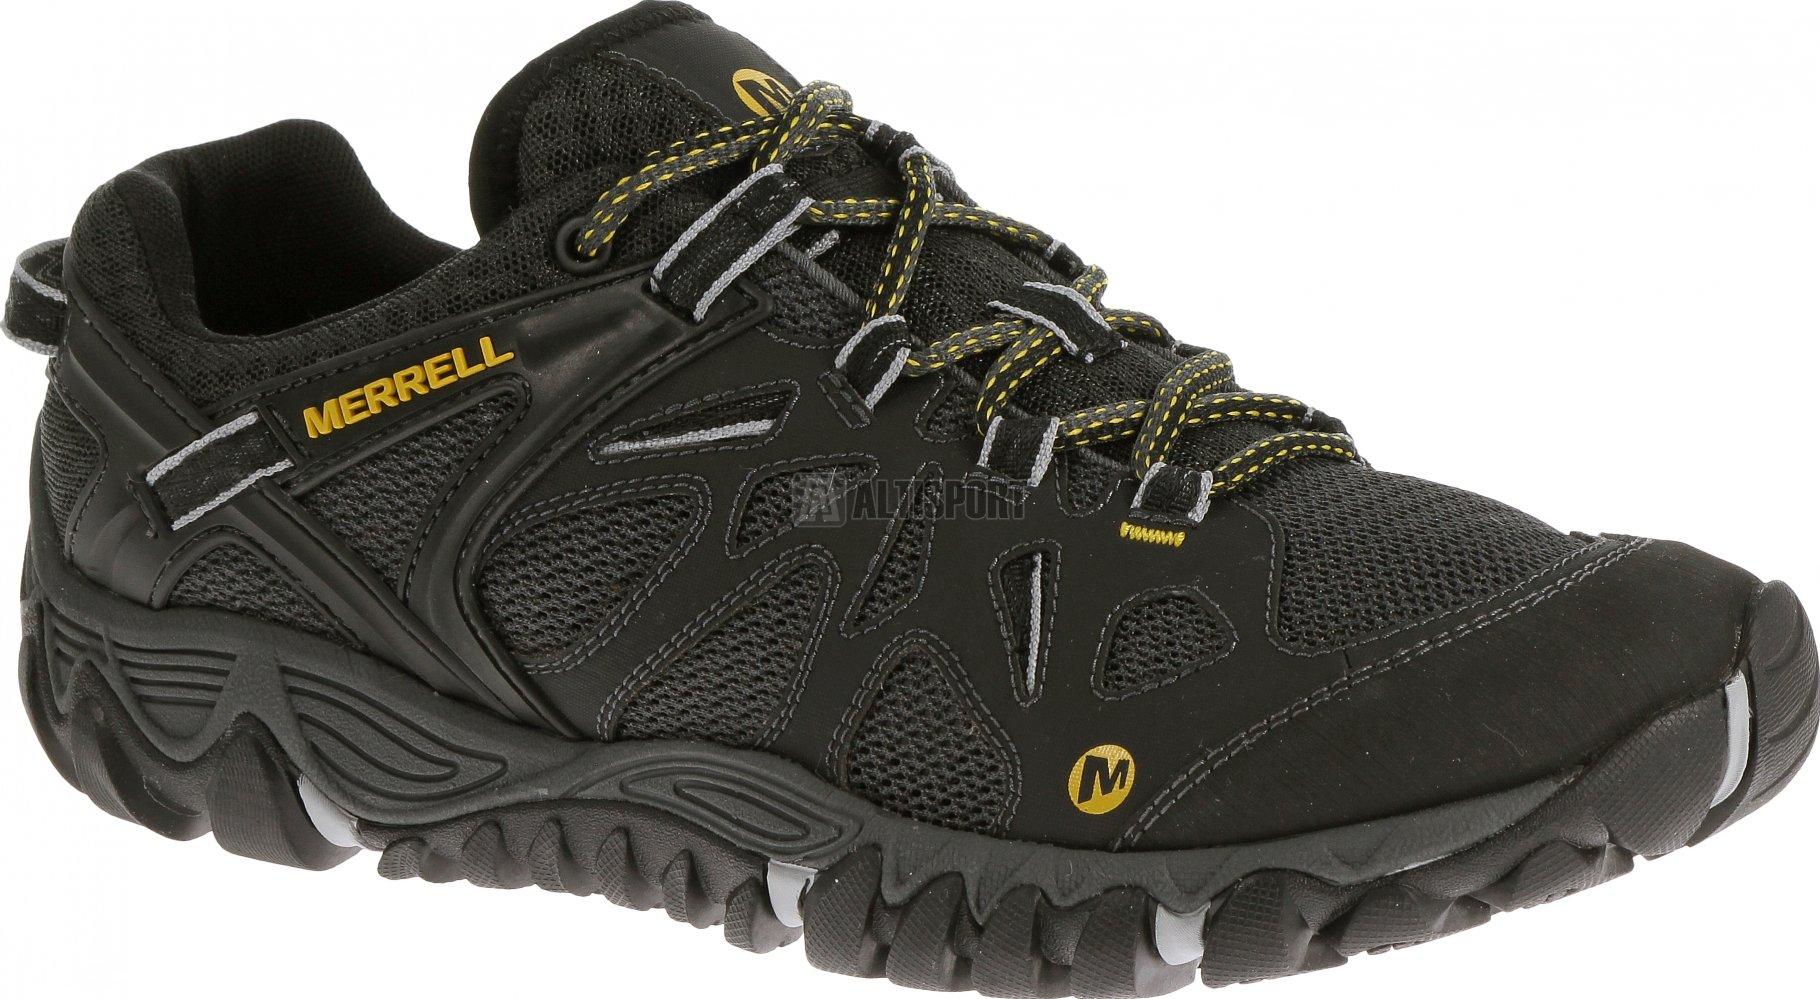 07287d778b4 Pánská obuv MERRELL ALL OUT BLAZE AERO SPORT J32441 BLACK velikost ...